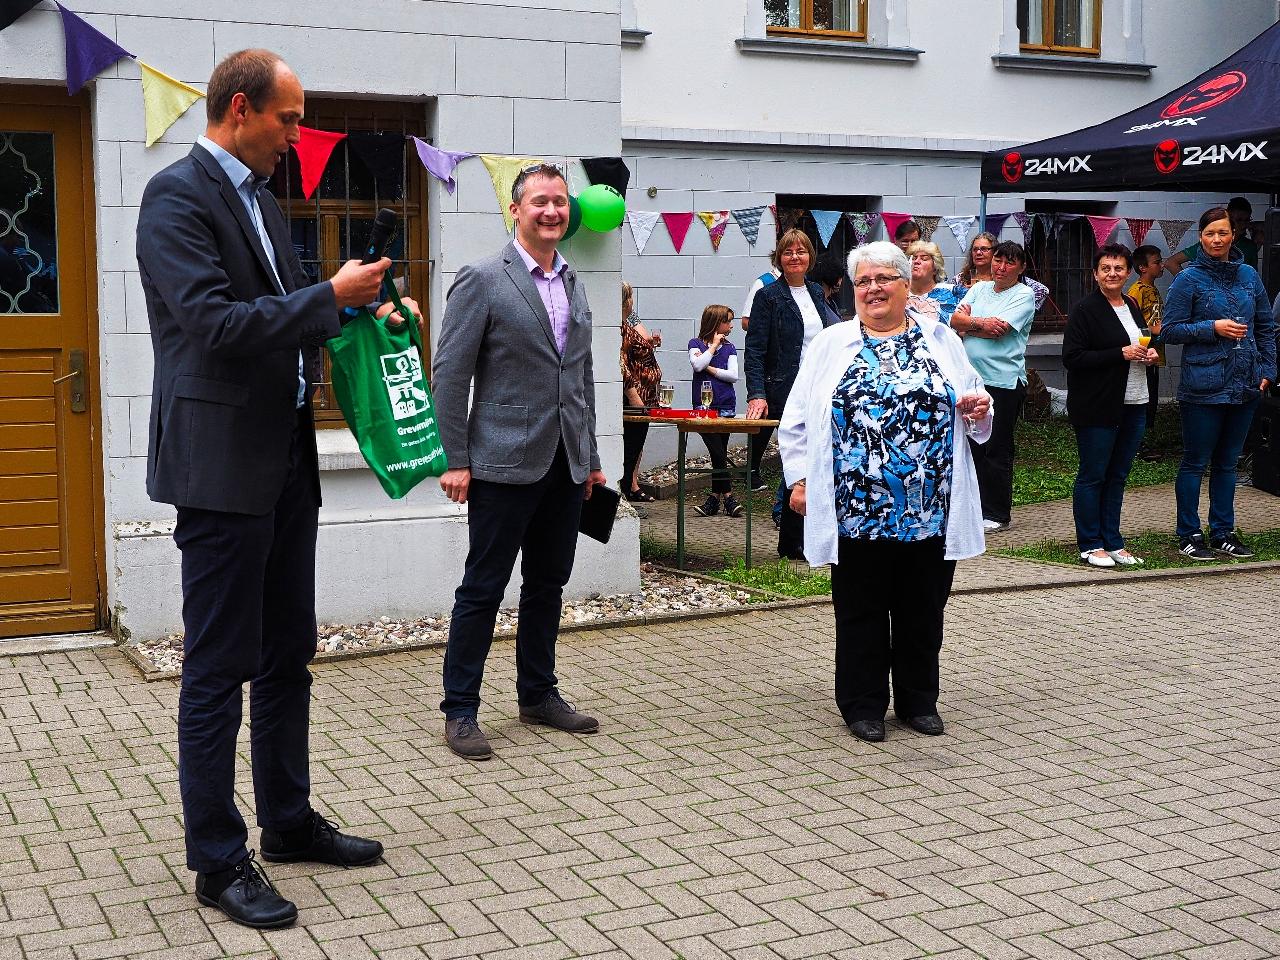 Laudator Herr Prahler (Stadt Grevesmühlen)